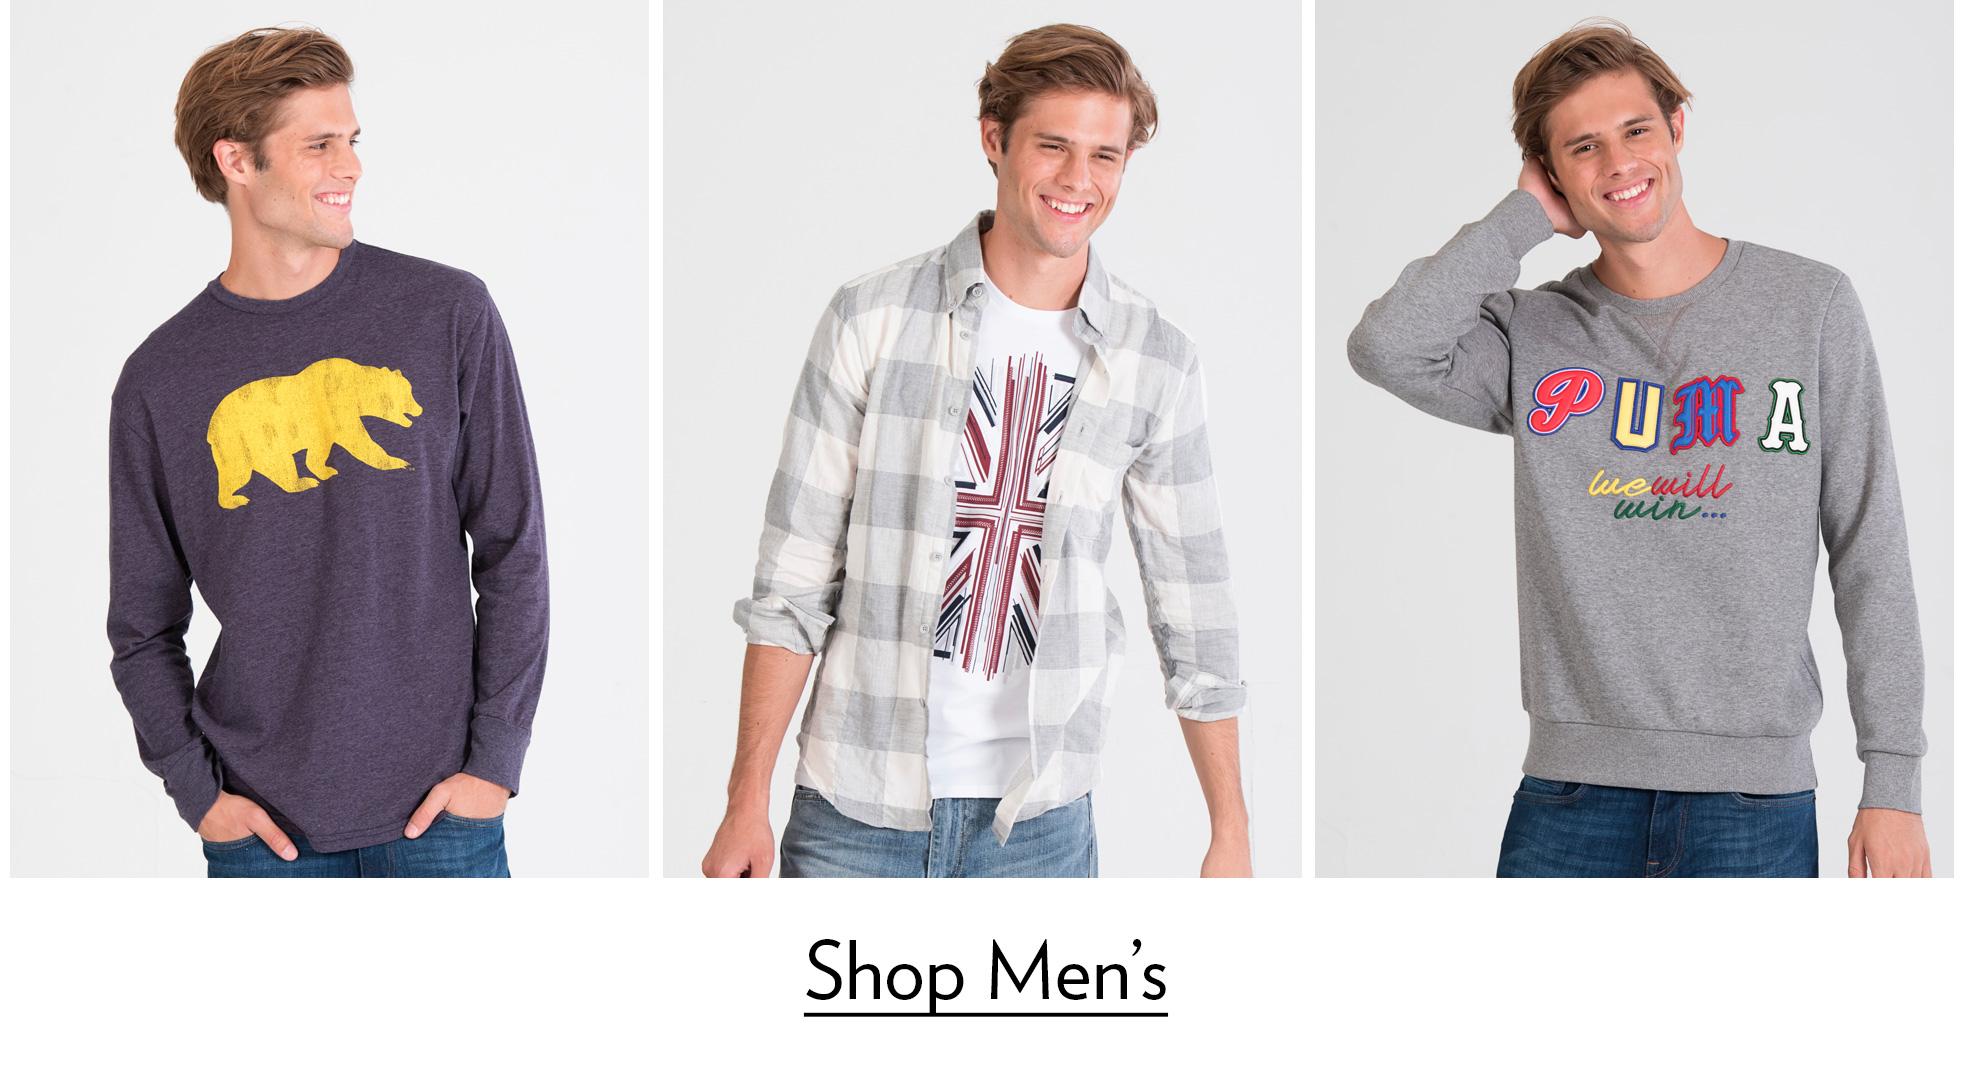 Men's Light Layer Tops